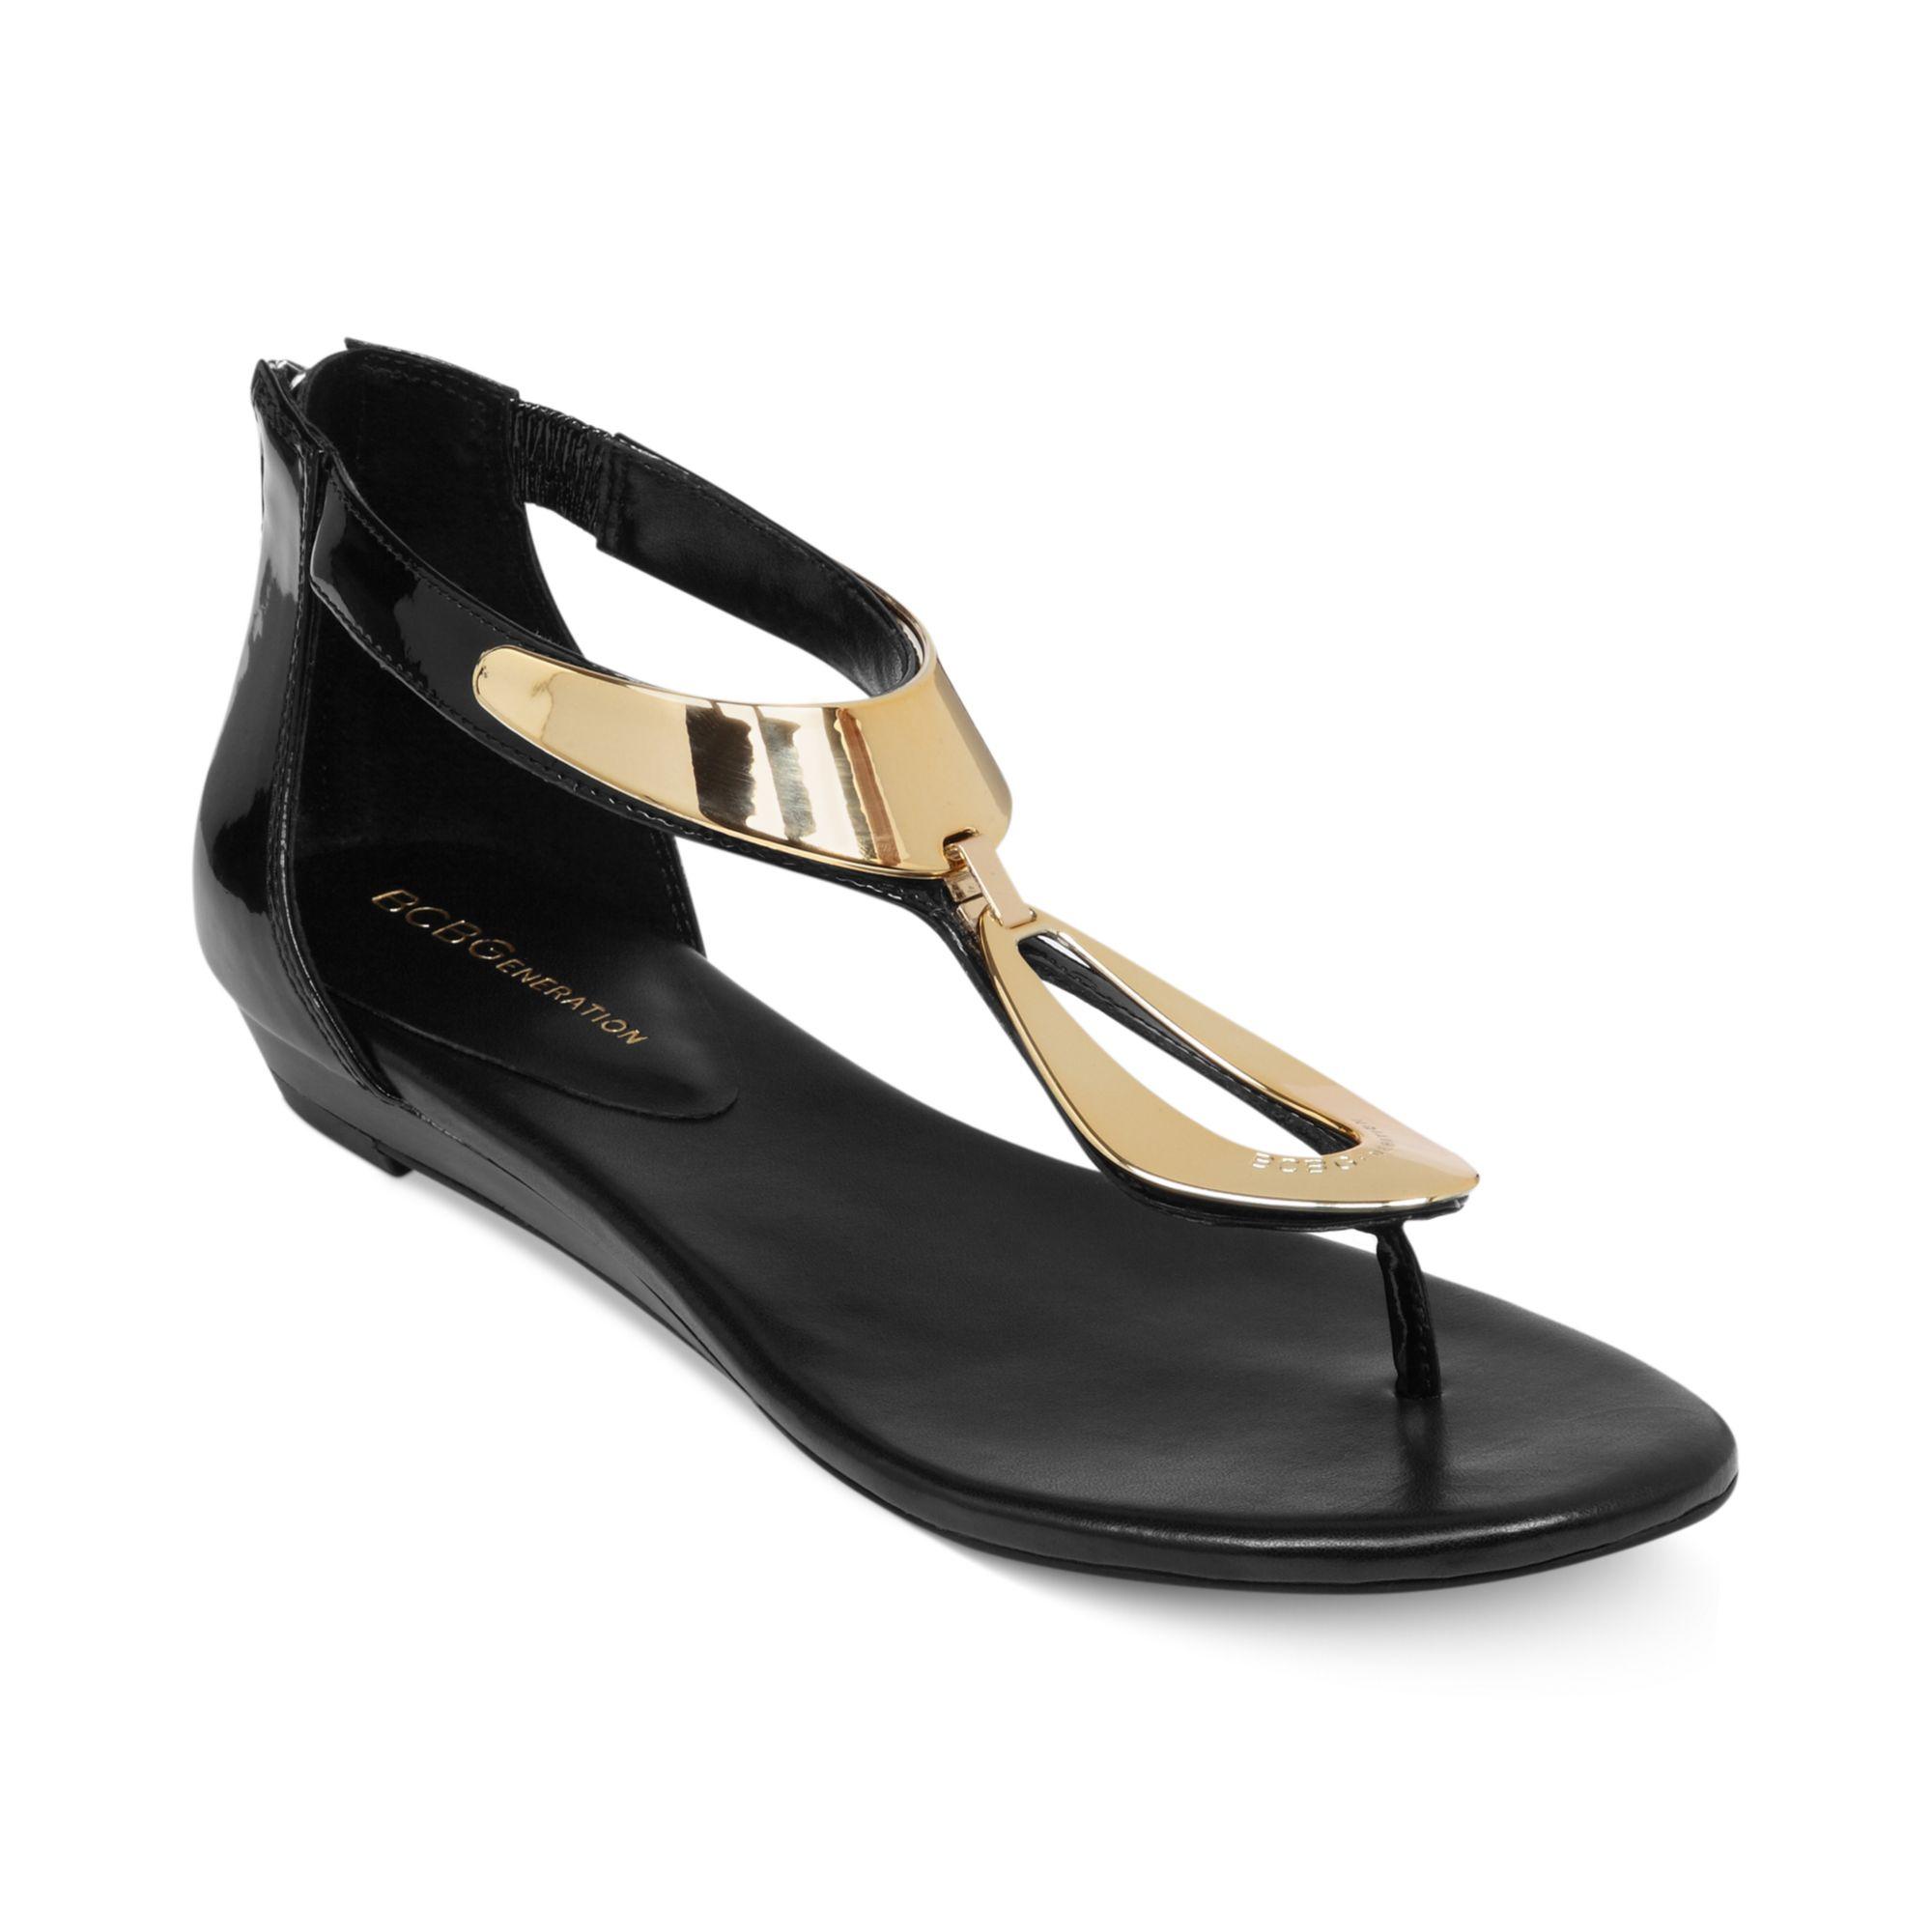 65c64d2b18a7 Lyst - BCBGeneration Anais Flat Thong Sandals in Black